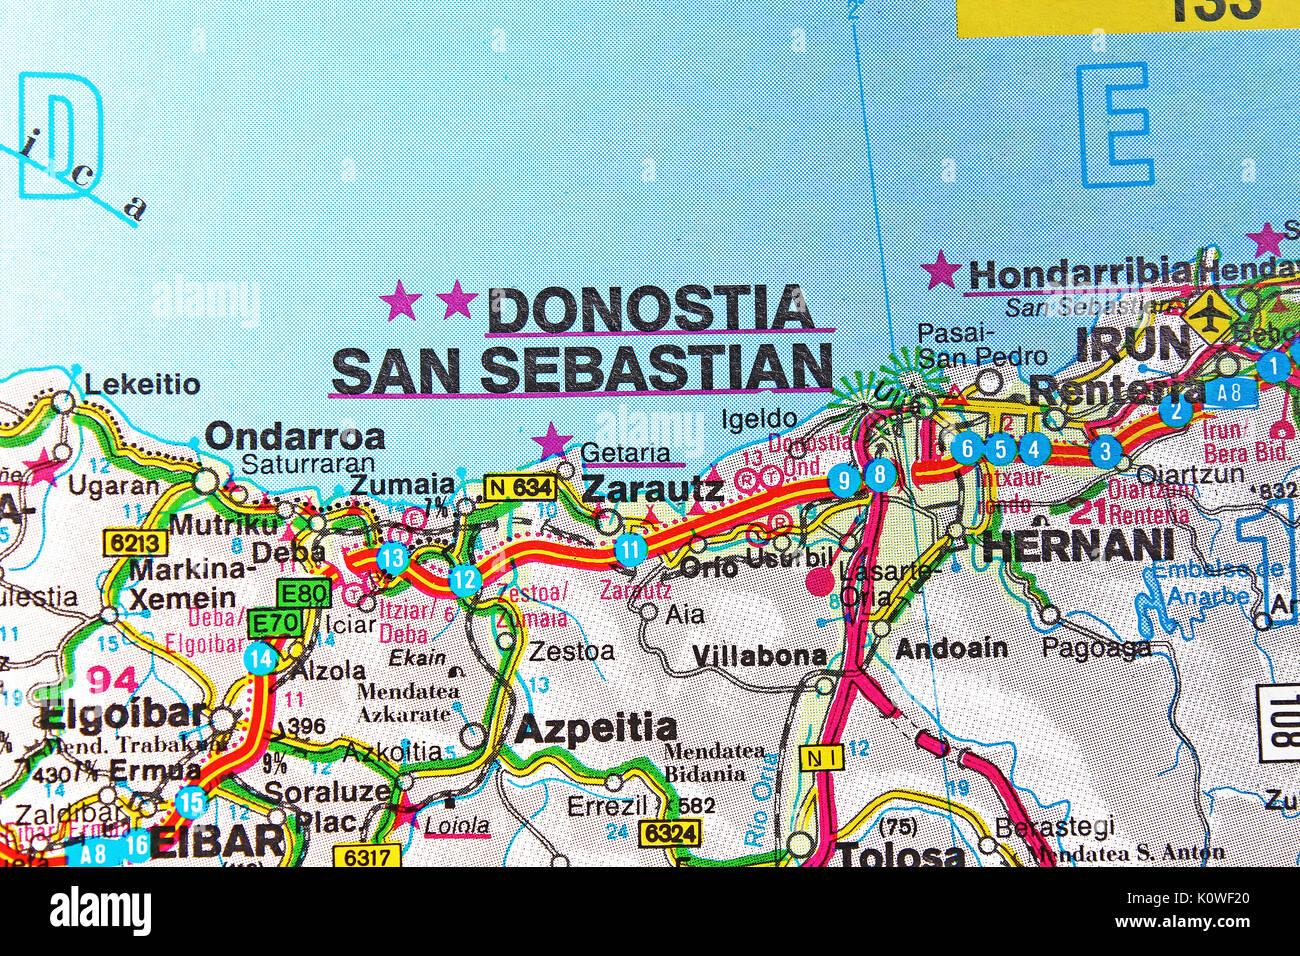 San Sebastian Spagna Cartina.Donostia San Sebastian Mappa Mappa Della Citta Mappa Stradale Foto Stock Alamy